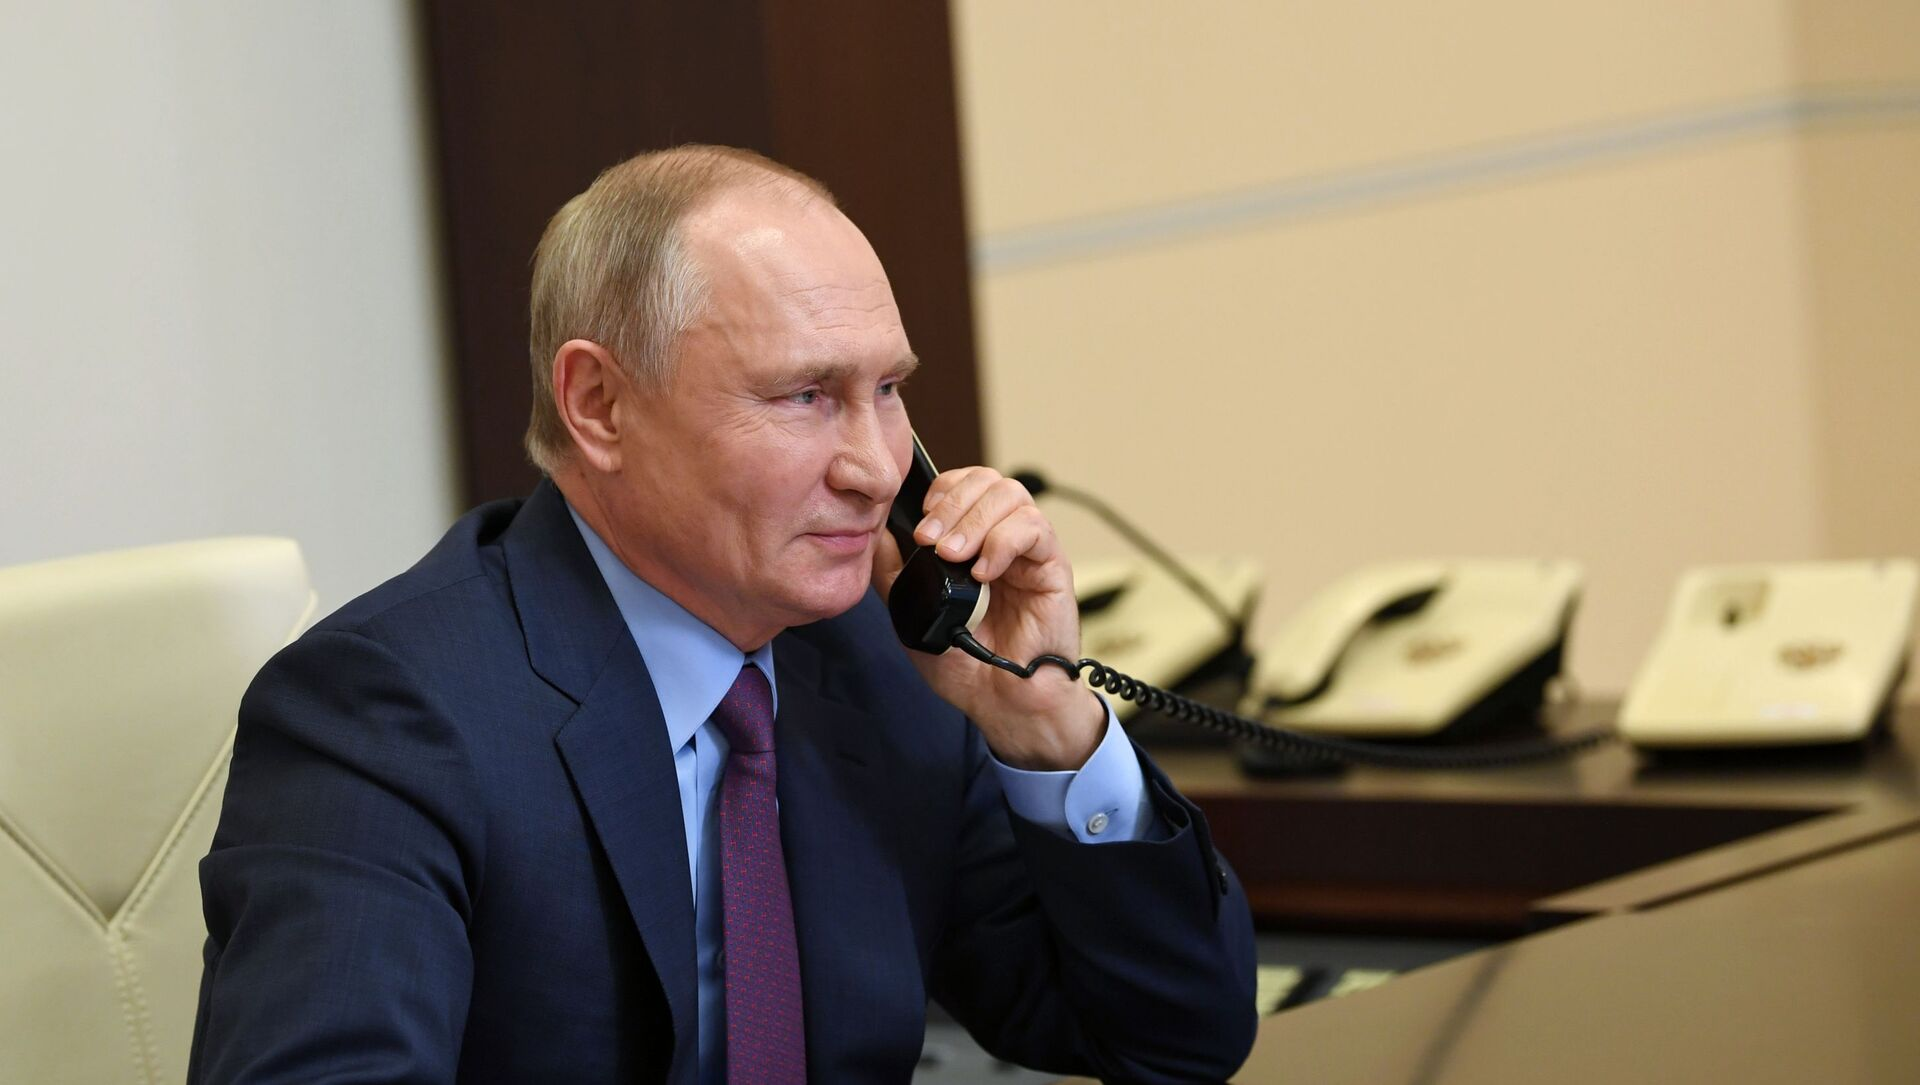 Президент РФ Владимир Путин во время встречи в режиме видеоконференции, фото из архива - Sputnik Azərbaycan, 1920, 14.09.2021